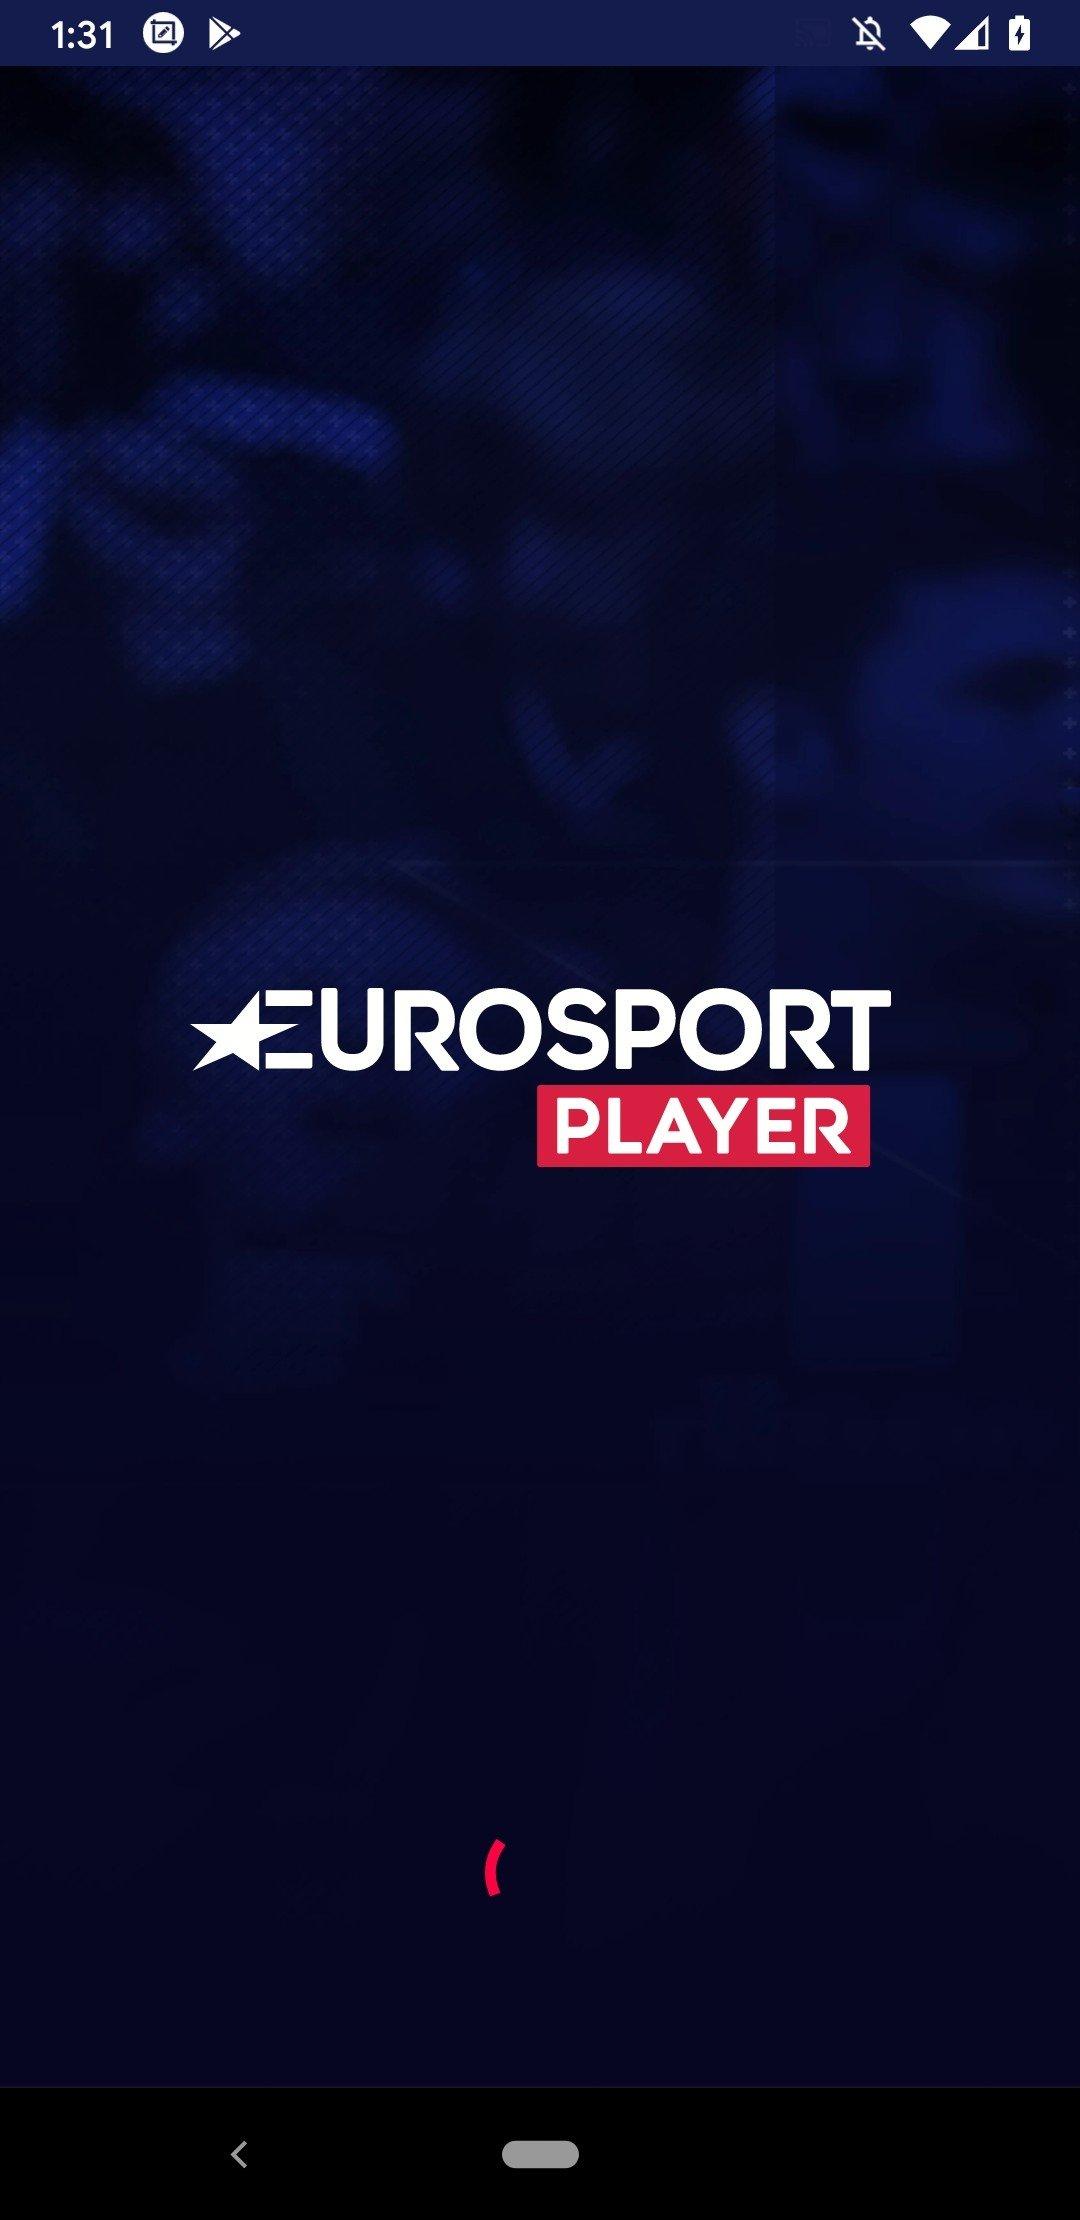 da eurosport player